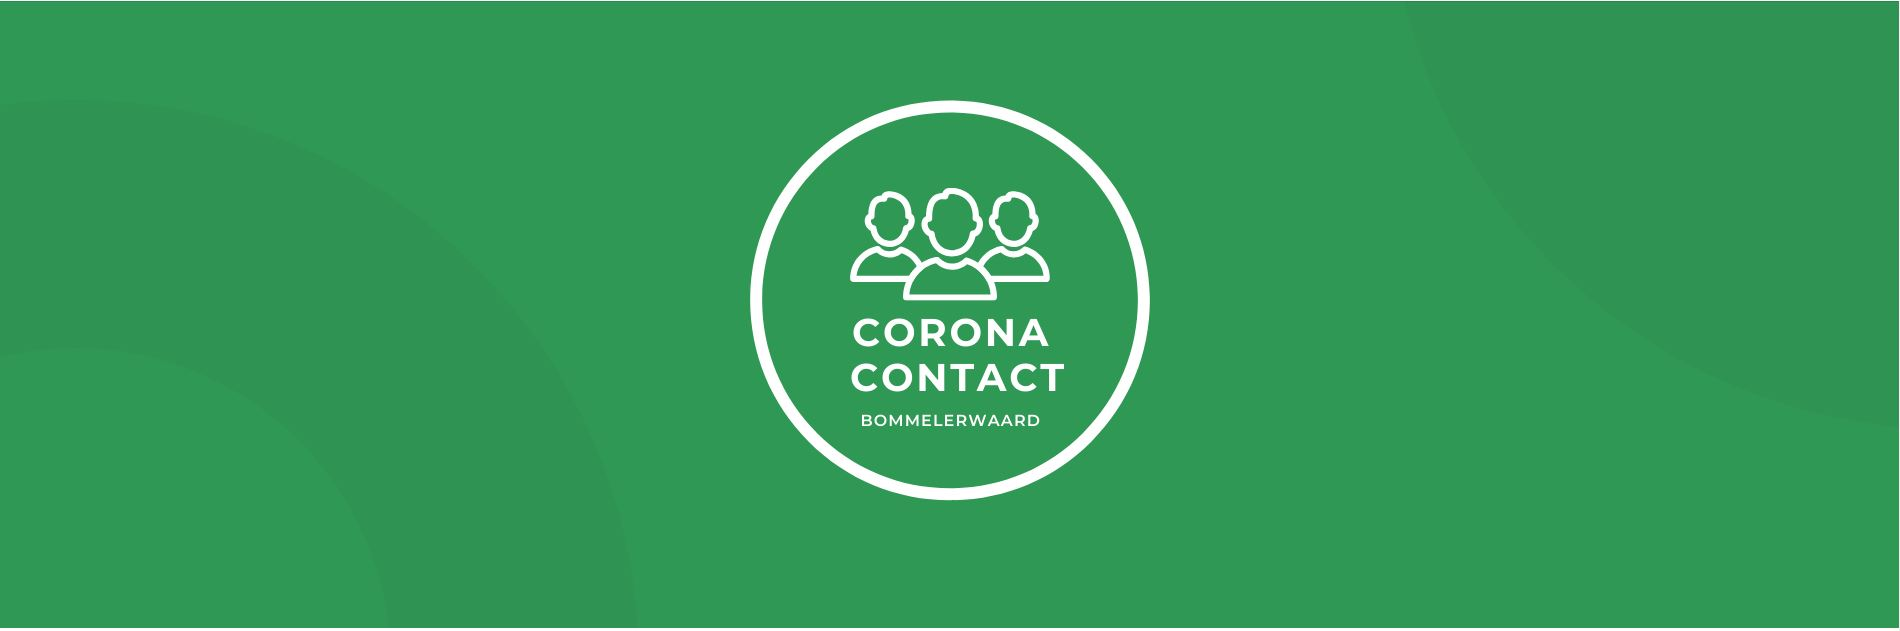 Corona contact Bommelerwaard